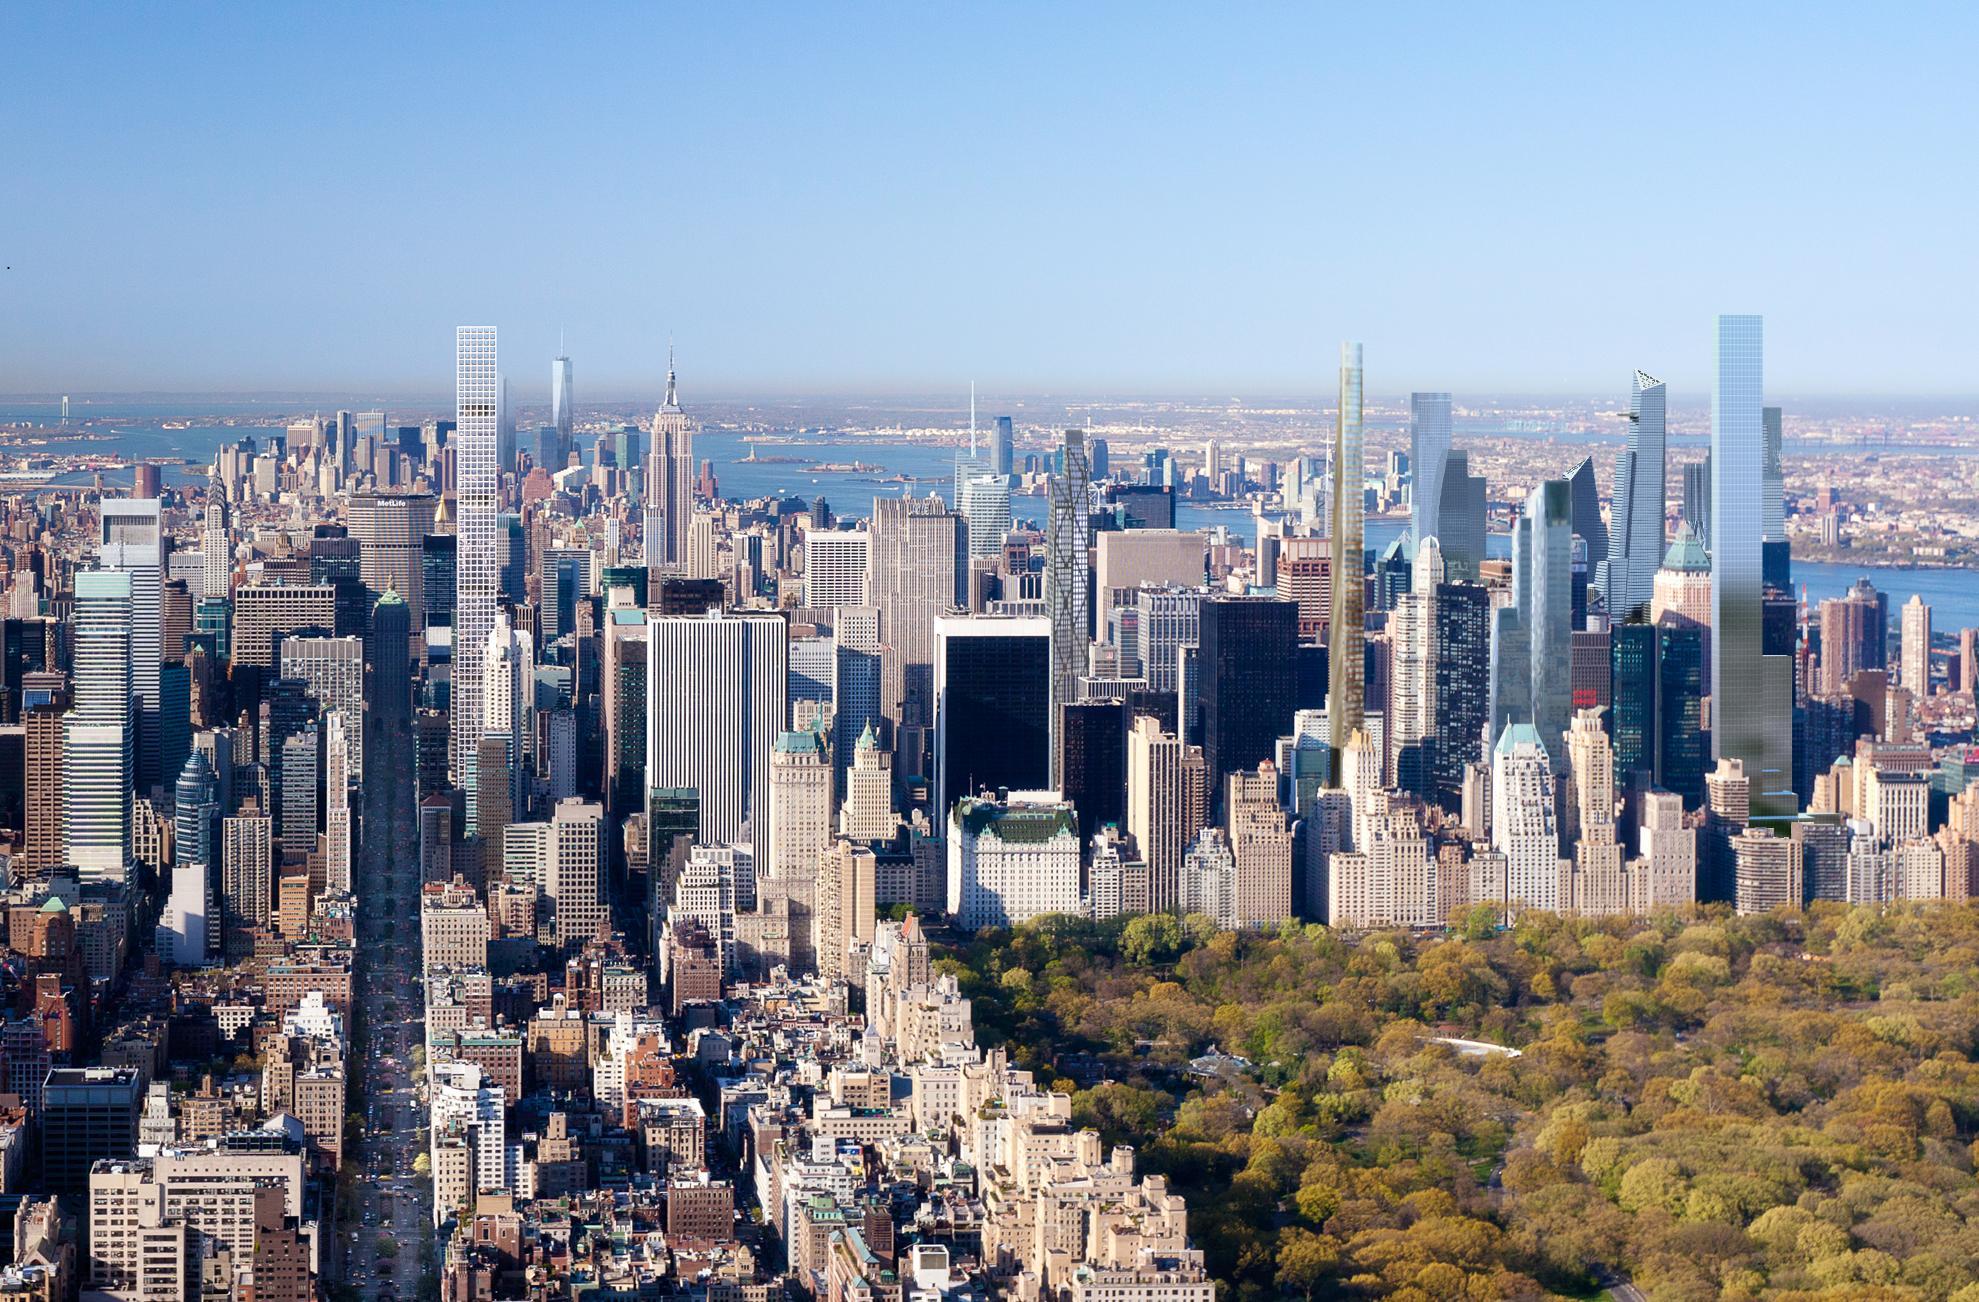 Mid-town Manhattan, New York